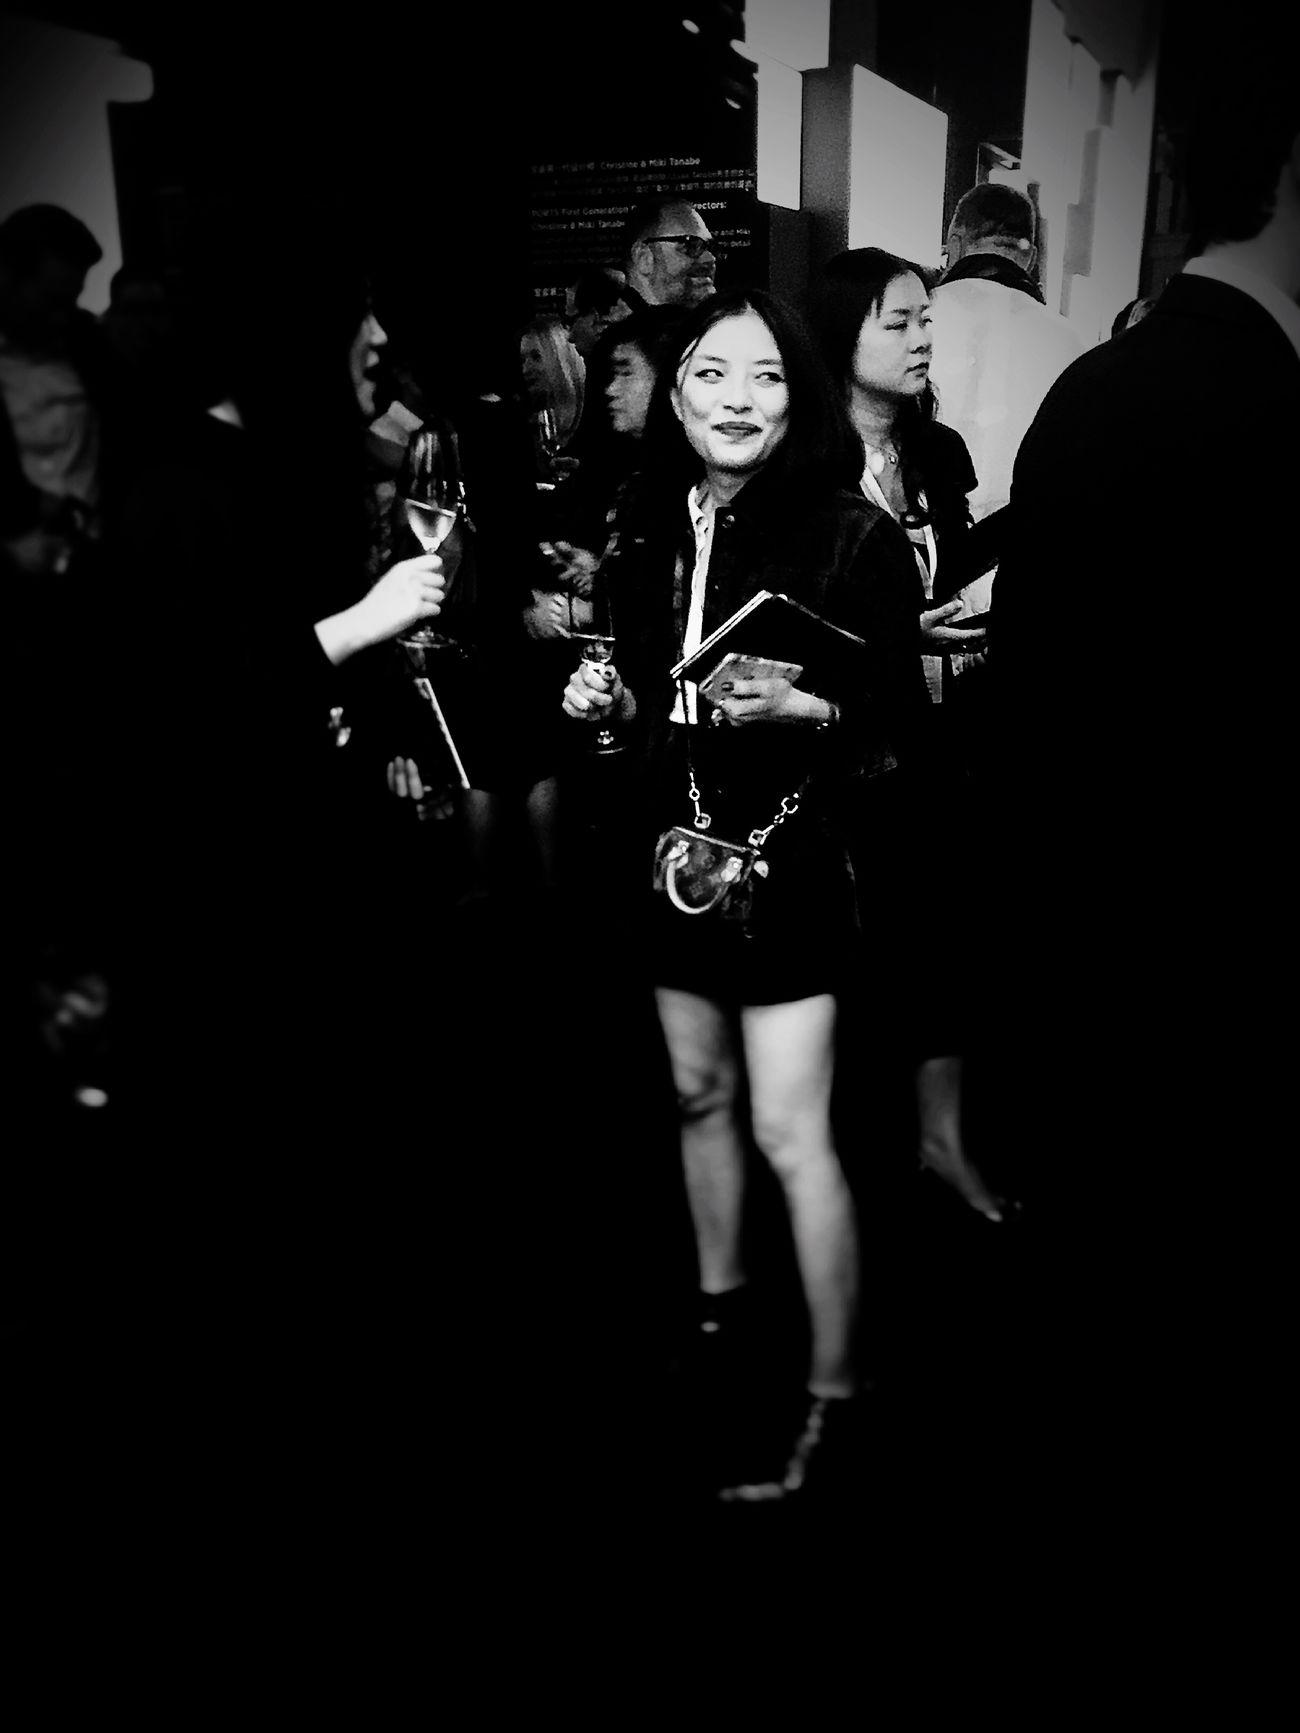 Girl Party People China Photos Shanghai, China Blackandwhite Eye4photography